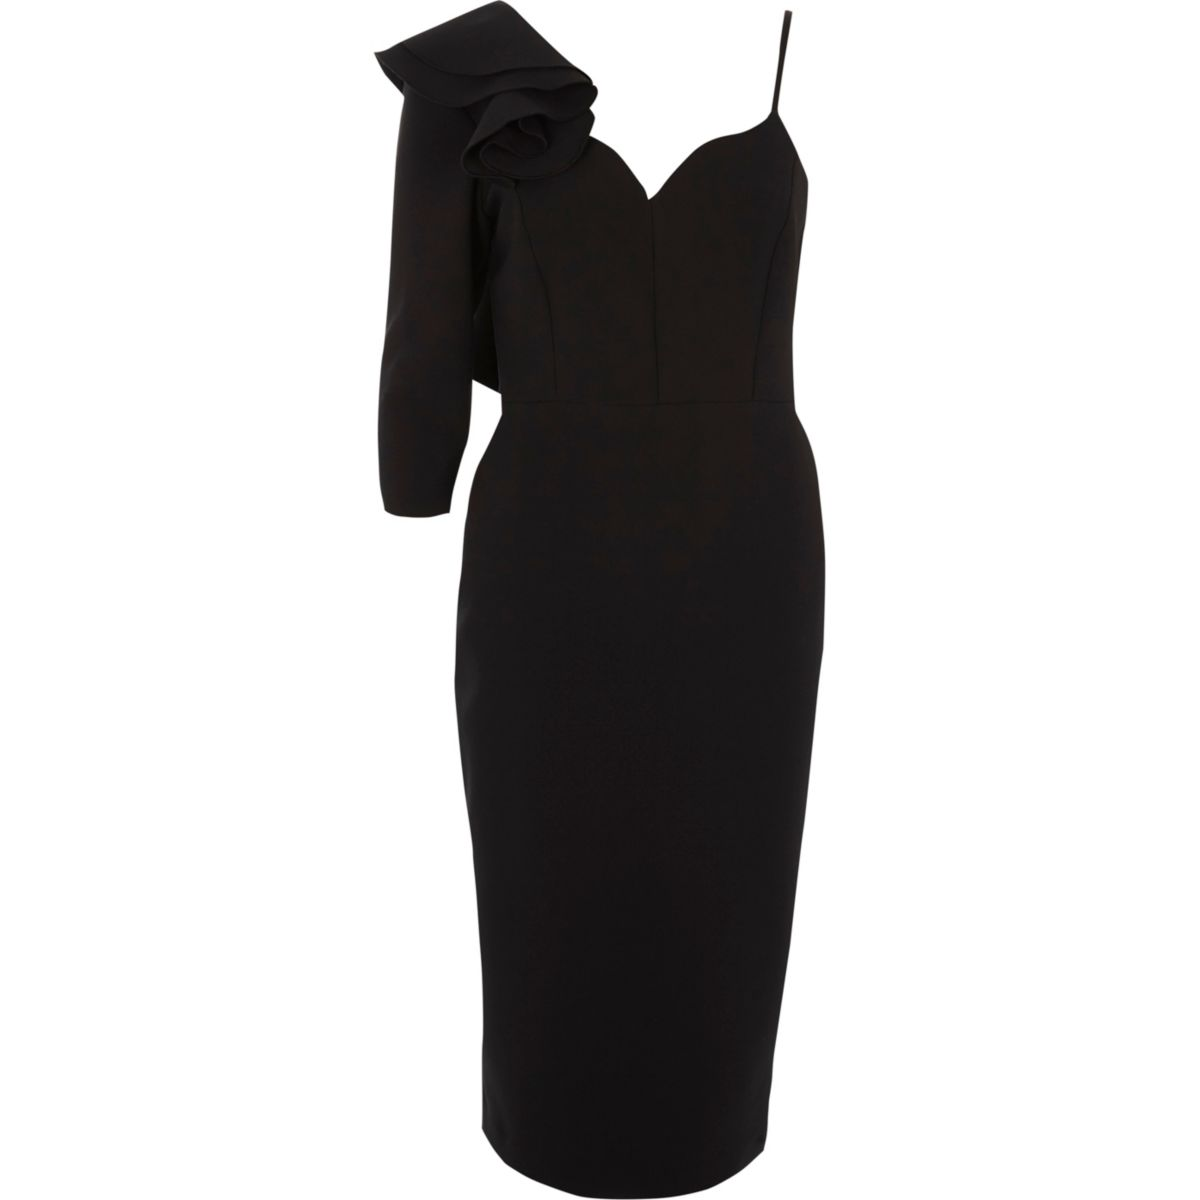 Black one shoulder ruffle bodycon midi dress